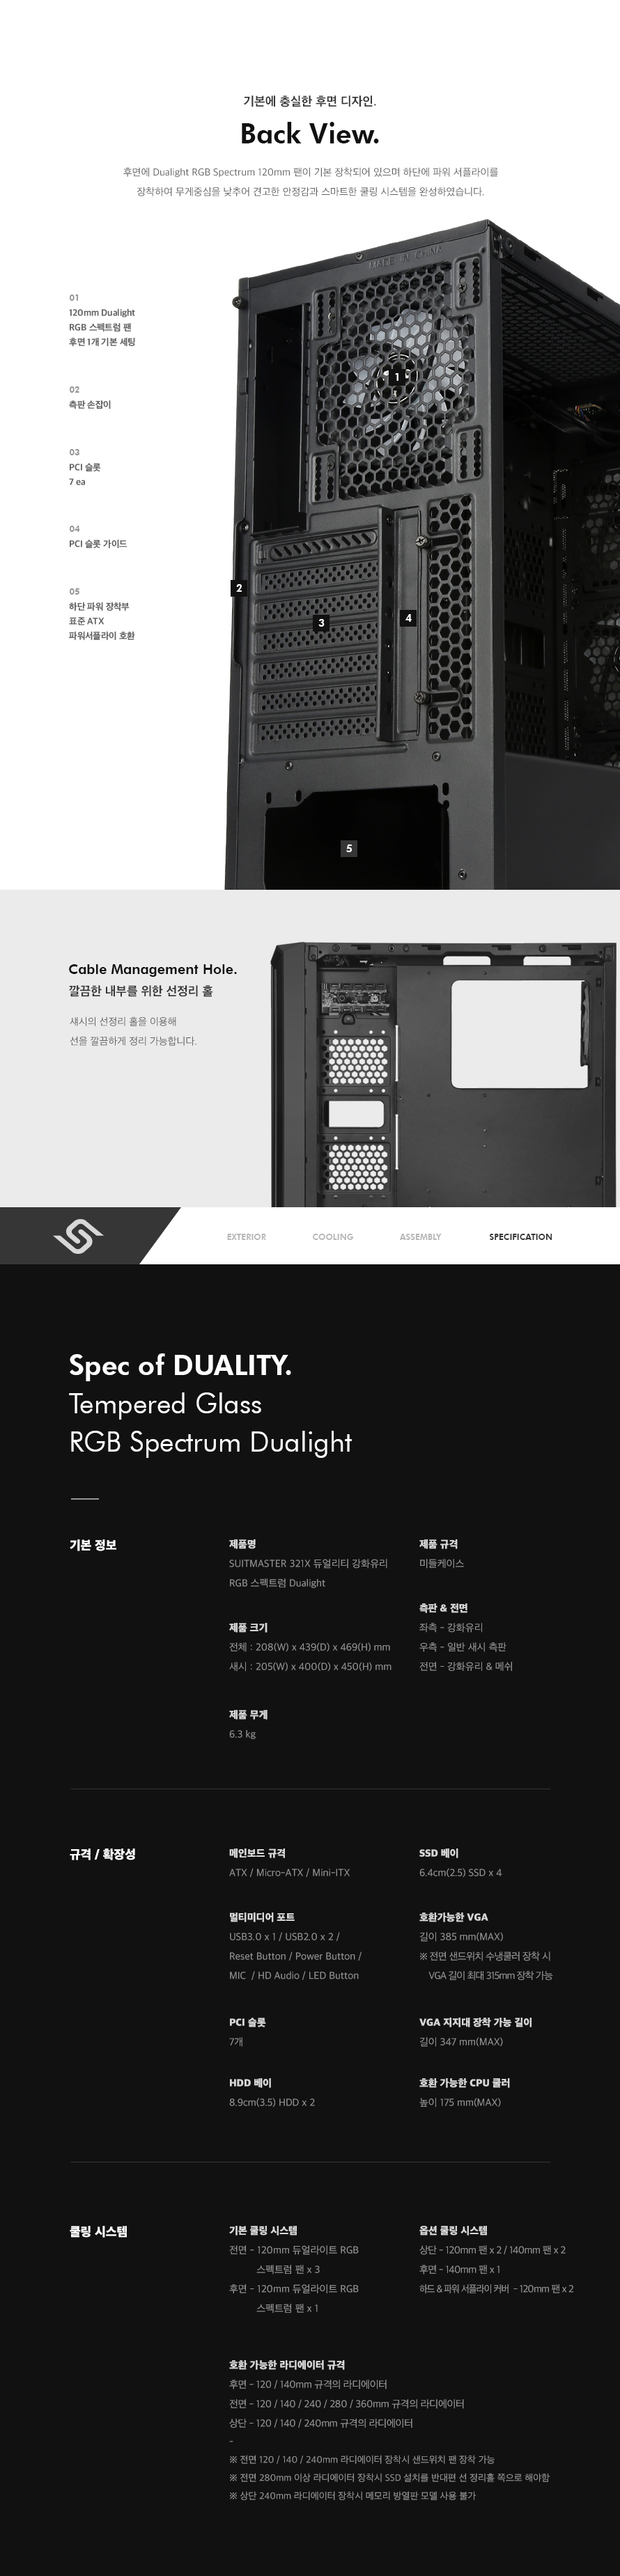 ABKO SUITMASTER 321X 듀얼리티 강화유리 스펙트럼 Dualight (블랙)